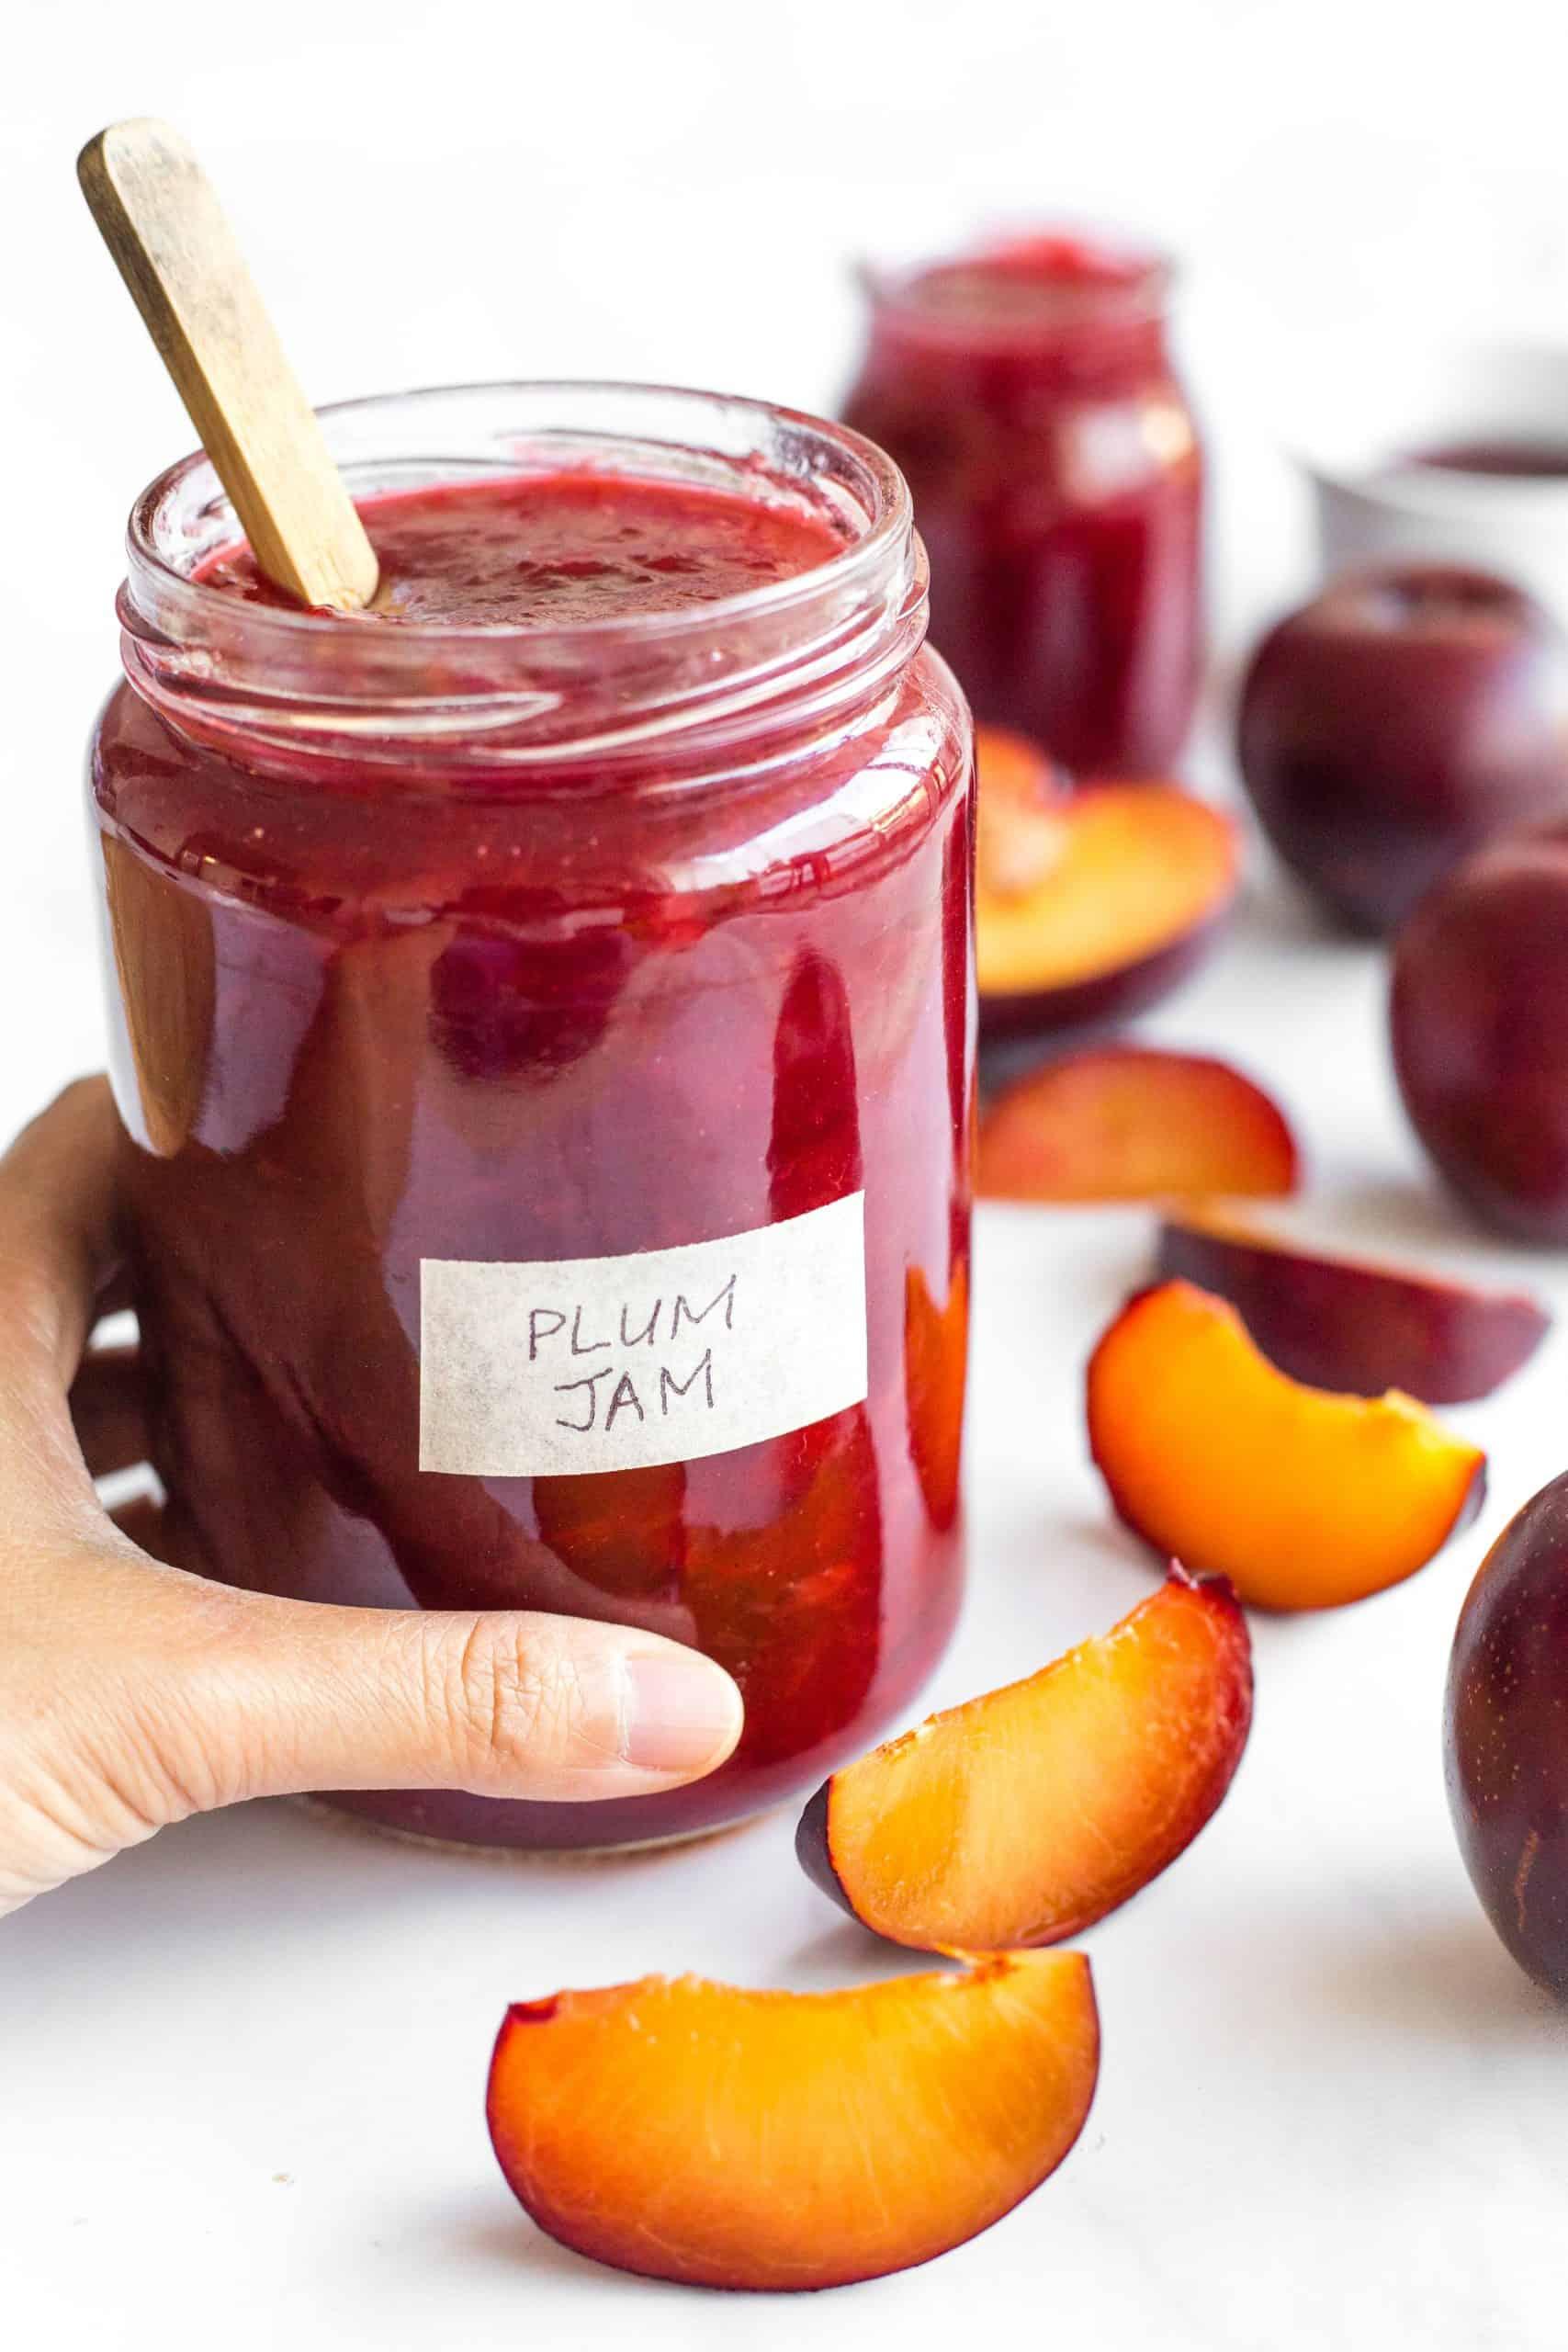 Hand holding a jar of plum jam